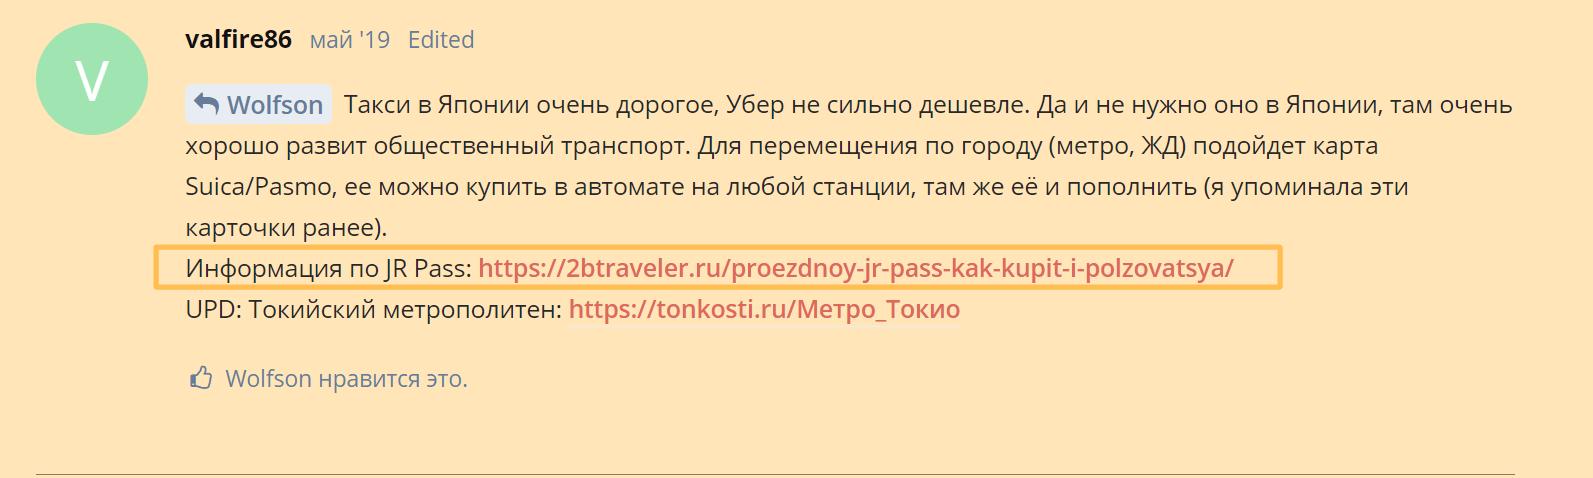 внешняя сео оптимизация сайта